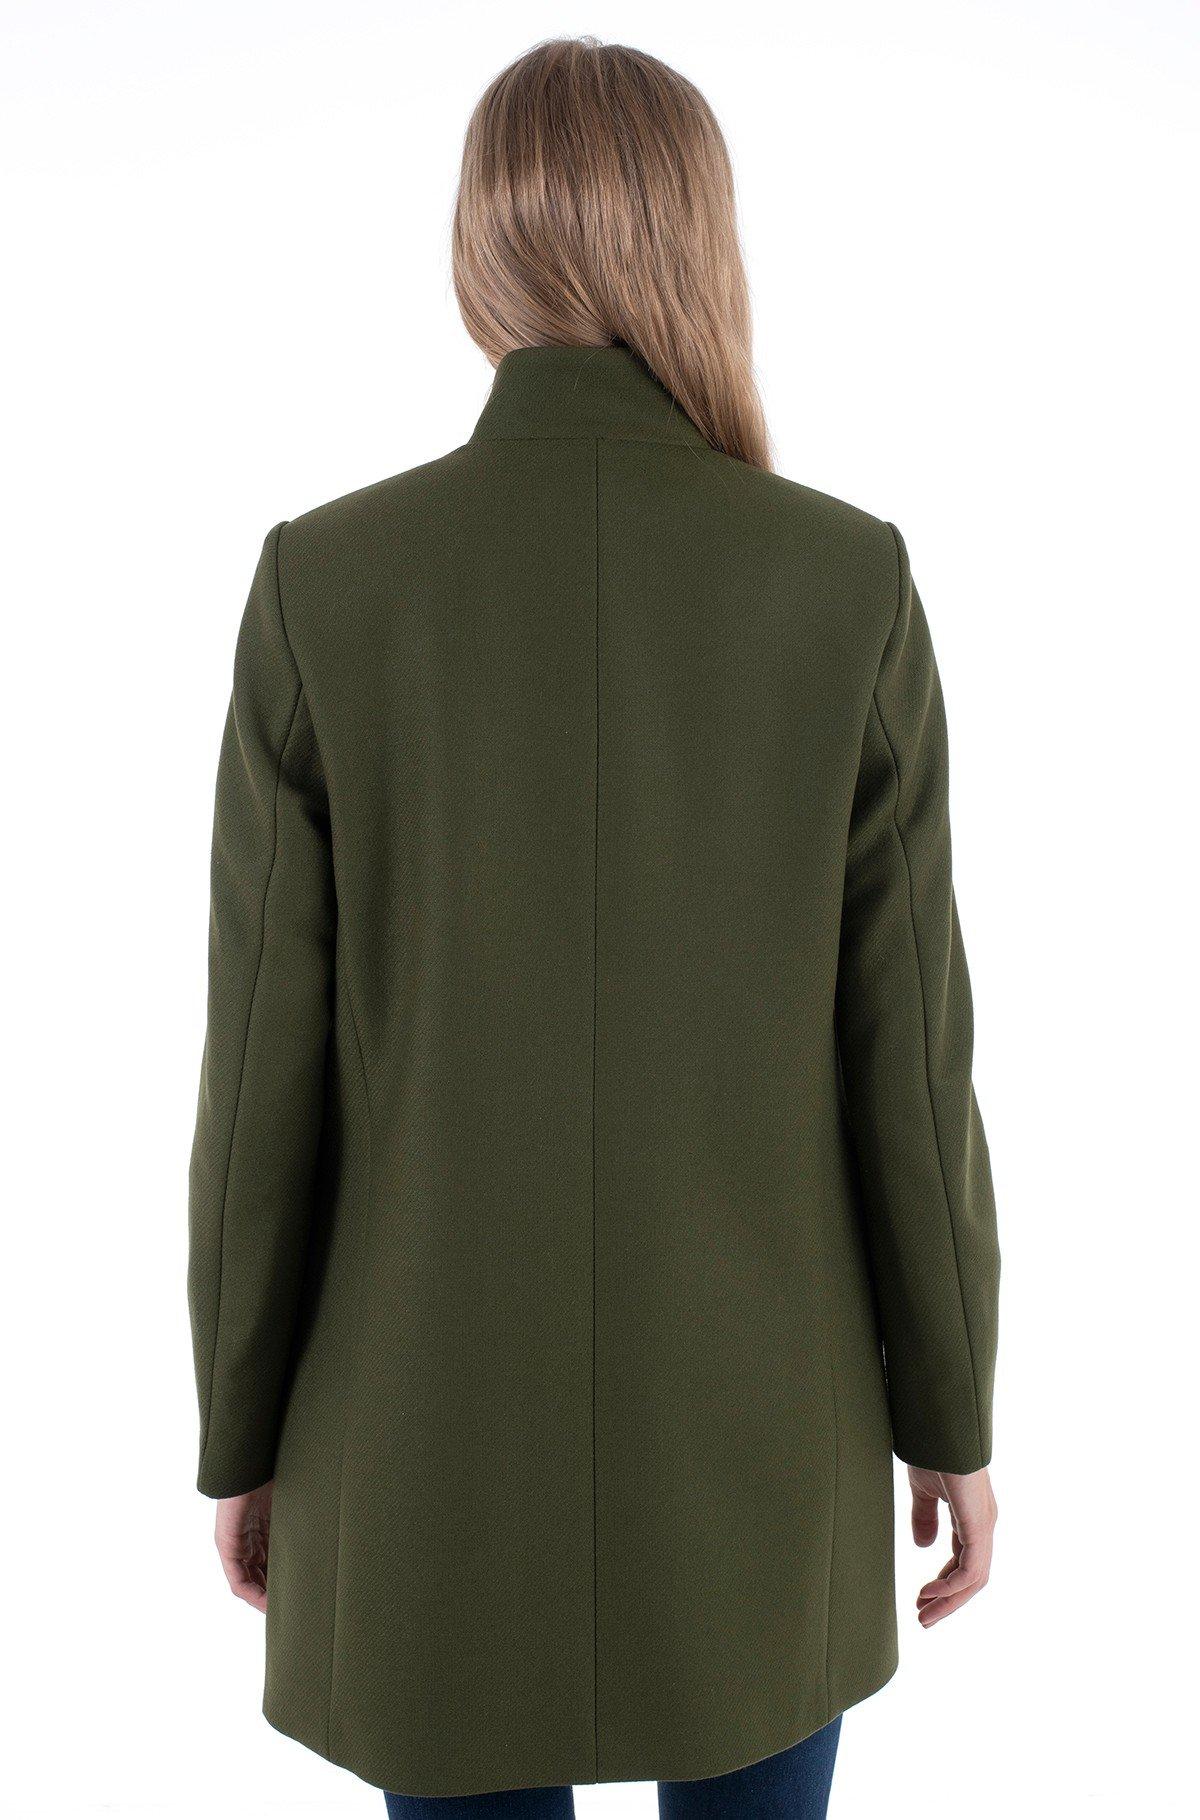 Coat WOOL BLEND SB HIP LENGTH COAT-full-3